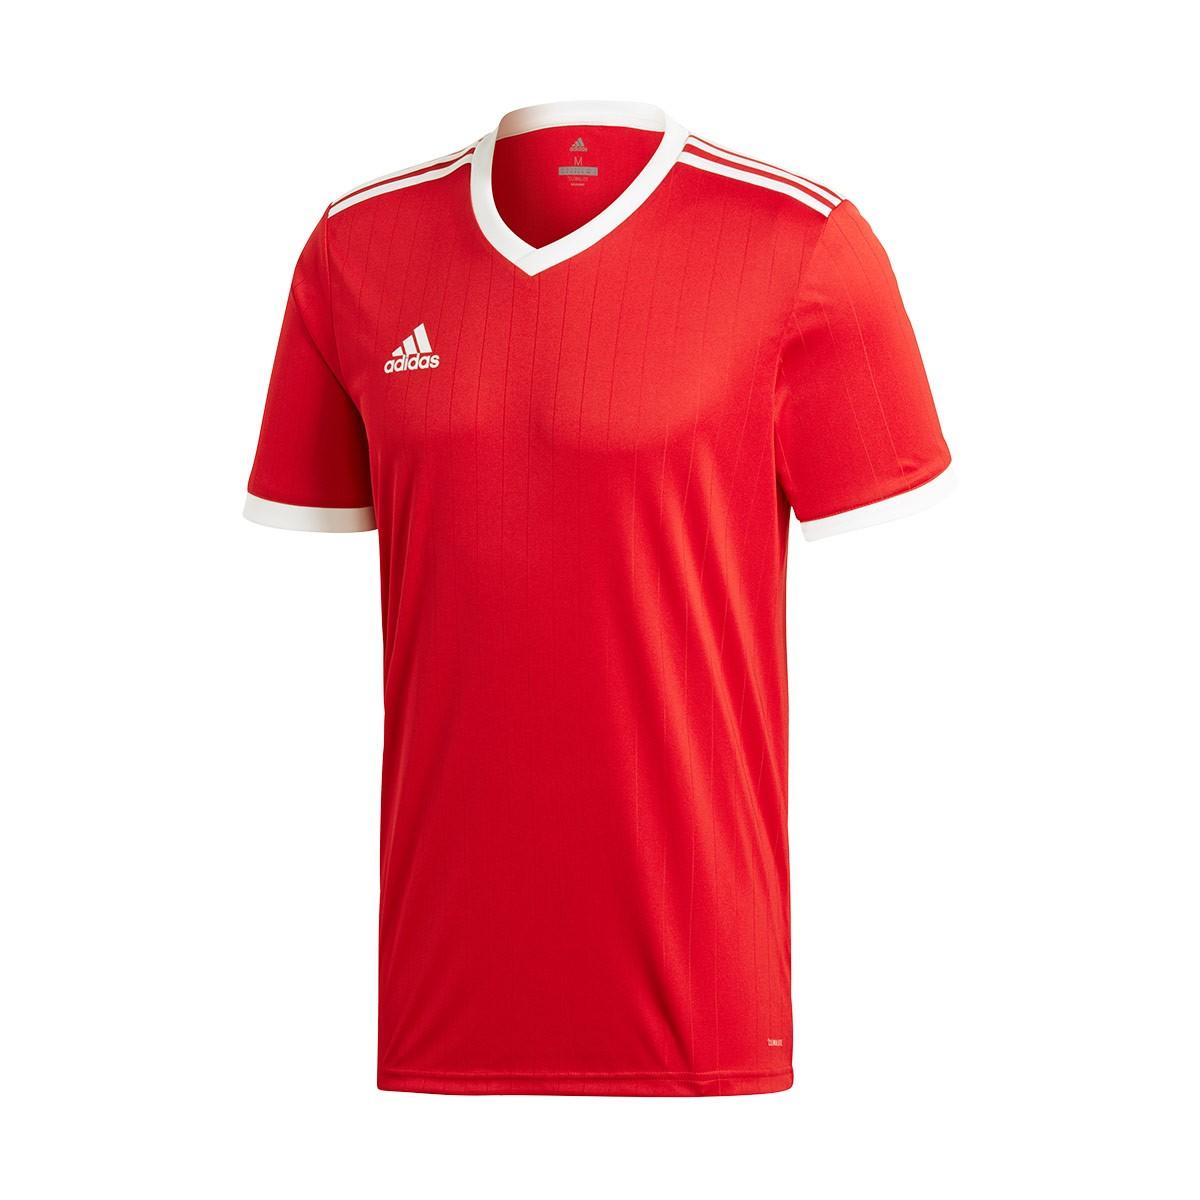 437075109 Jersey adidas Tabela 18 m/c Power red-White - Tienda de fútbol Fútbol  Emotion